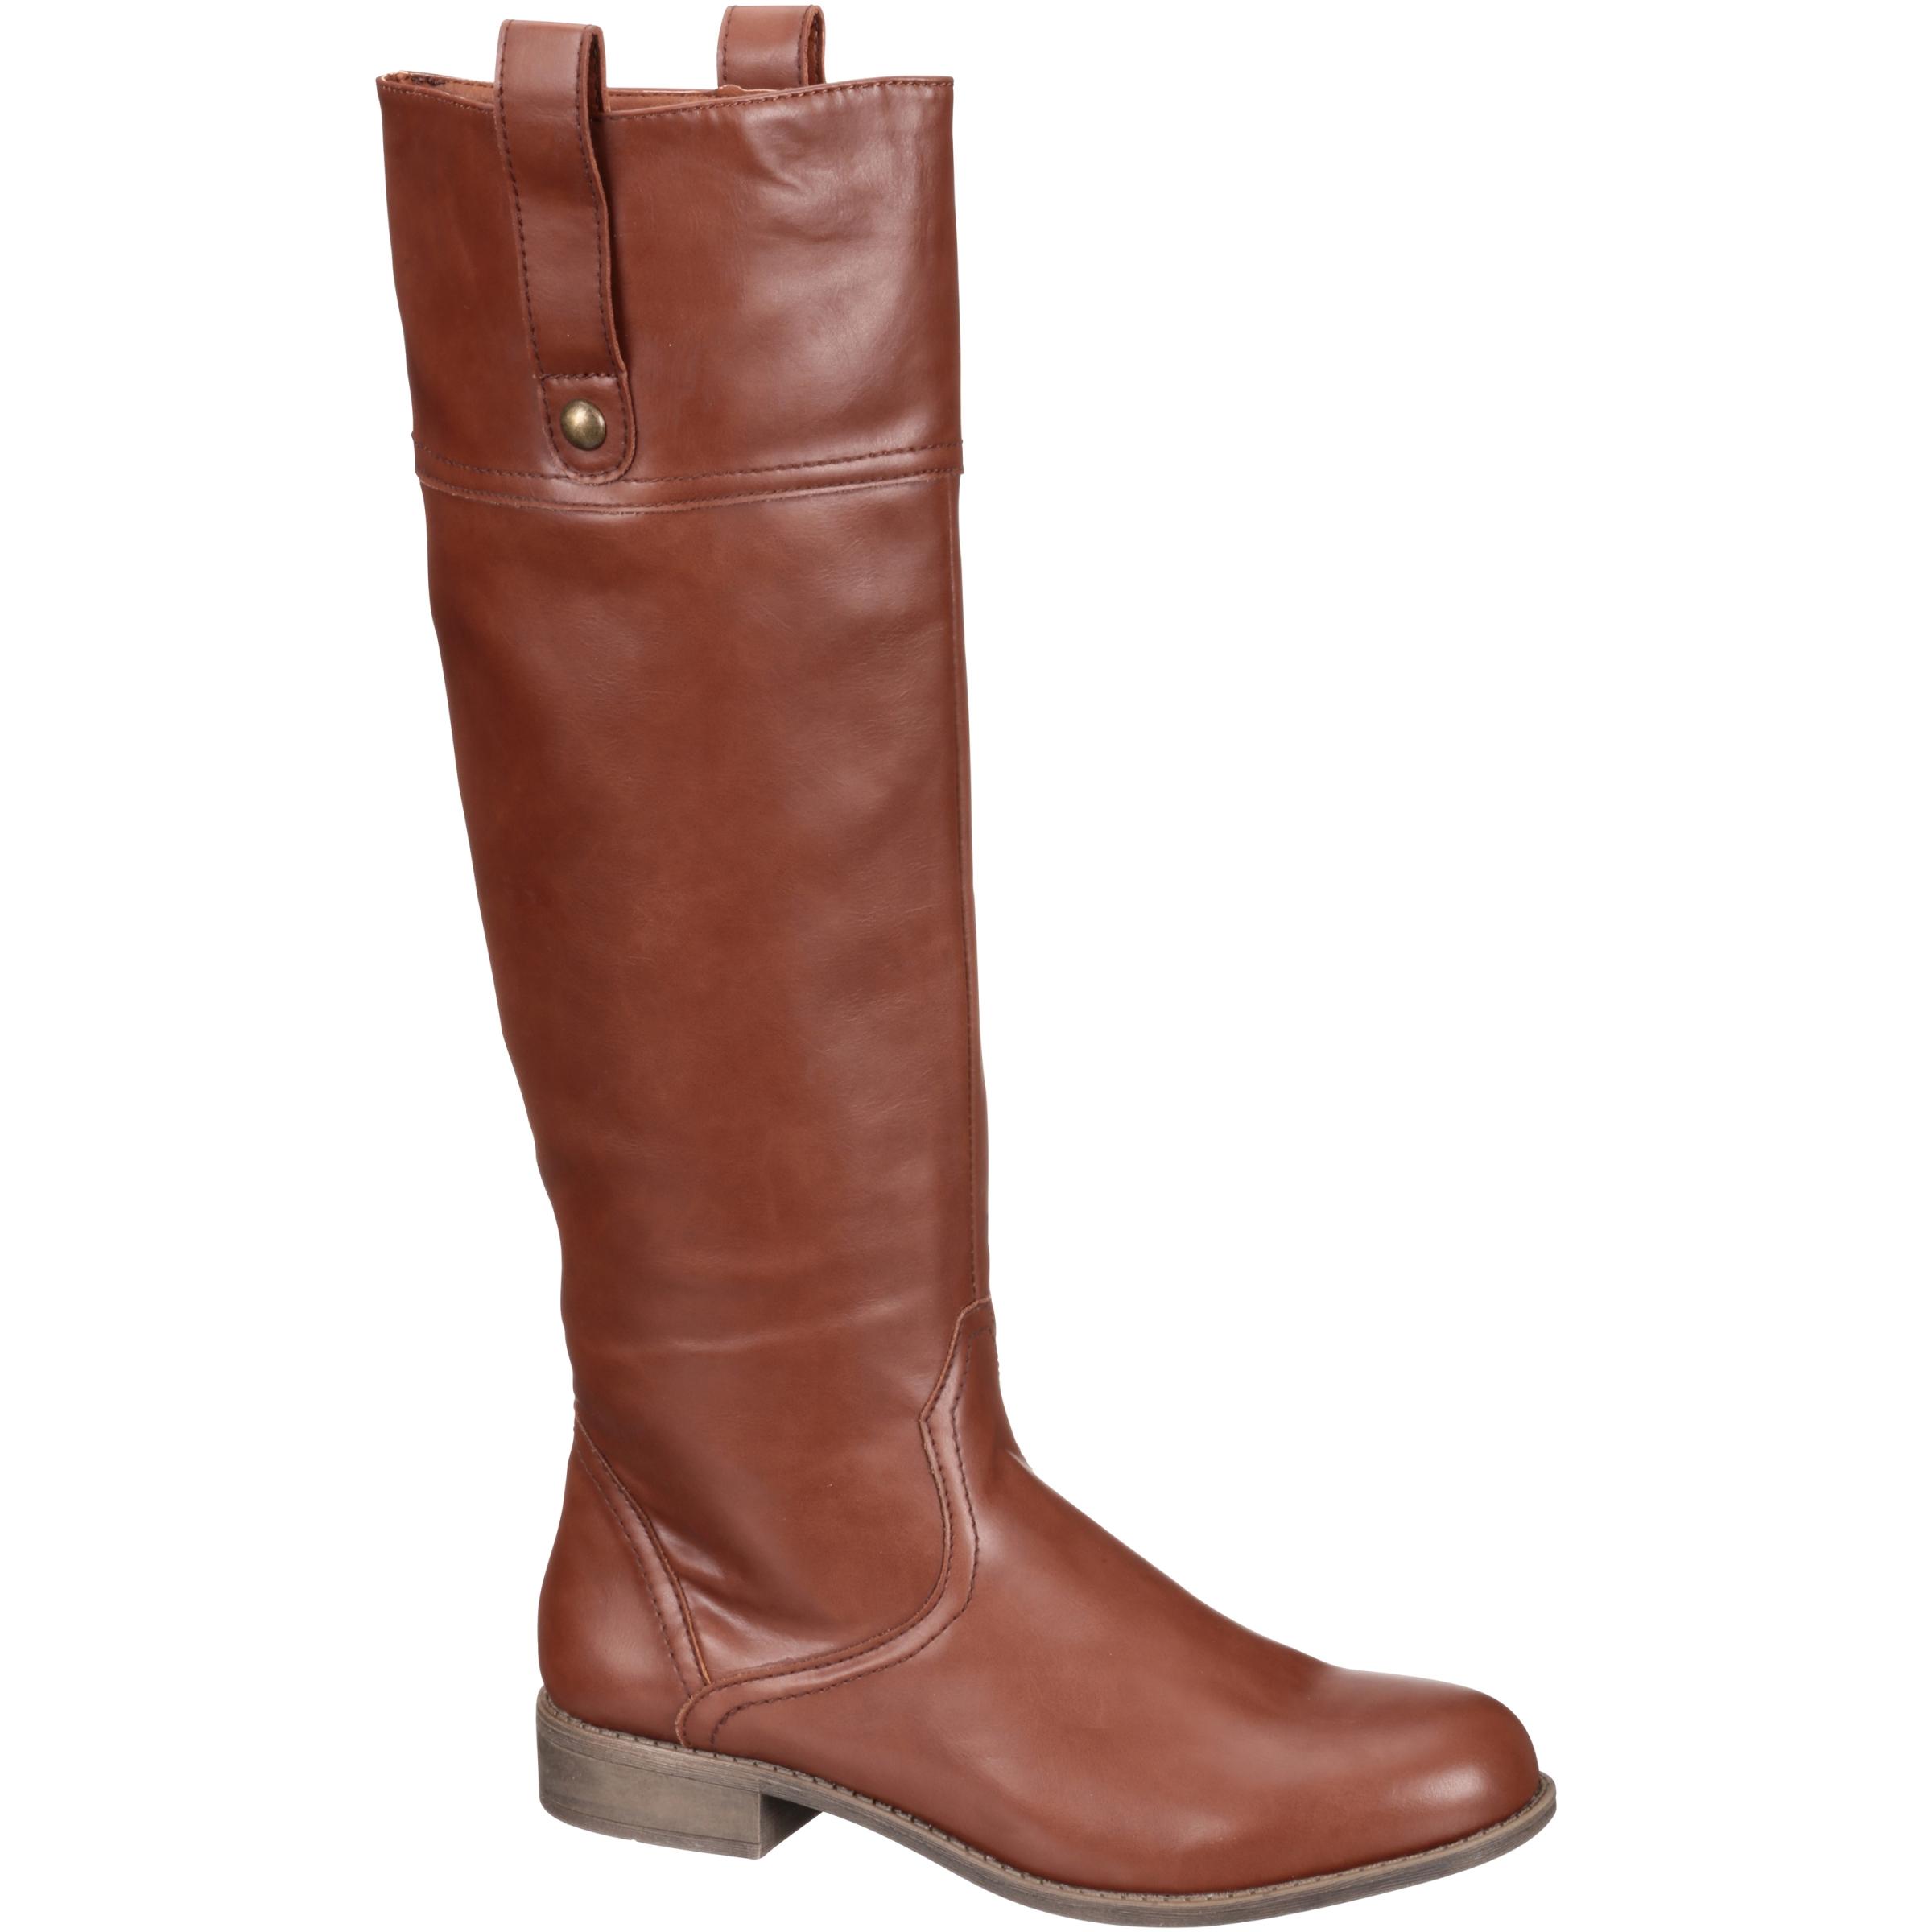 MoMo Women's Alani Boot Shoe Size: 7